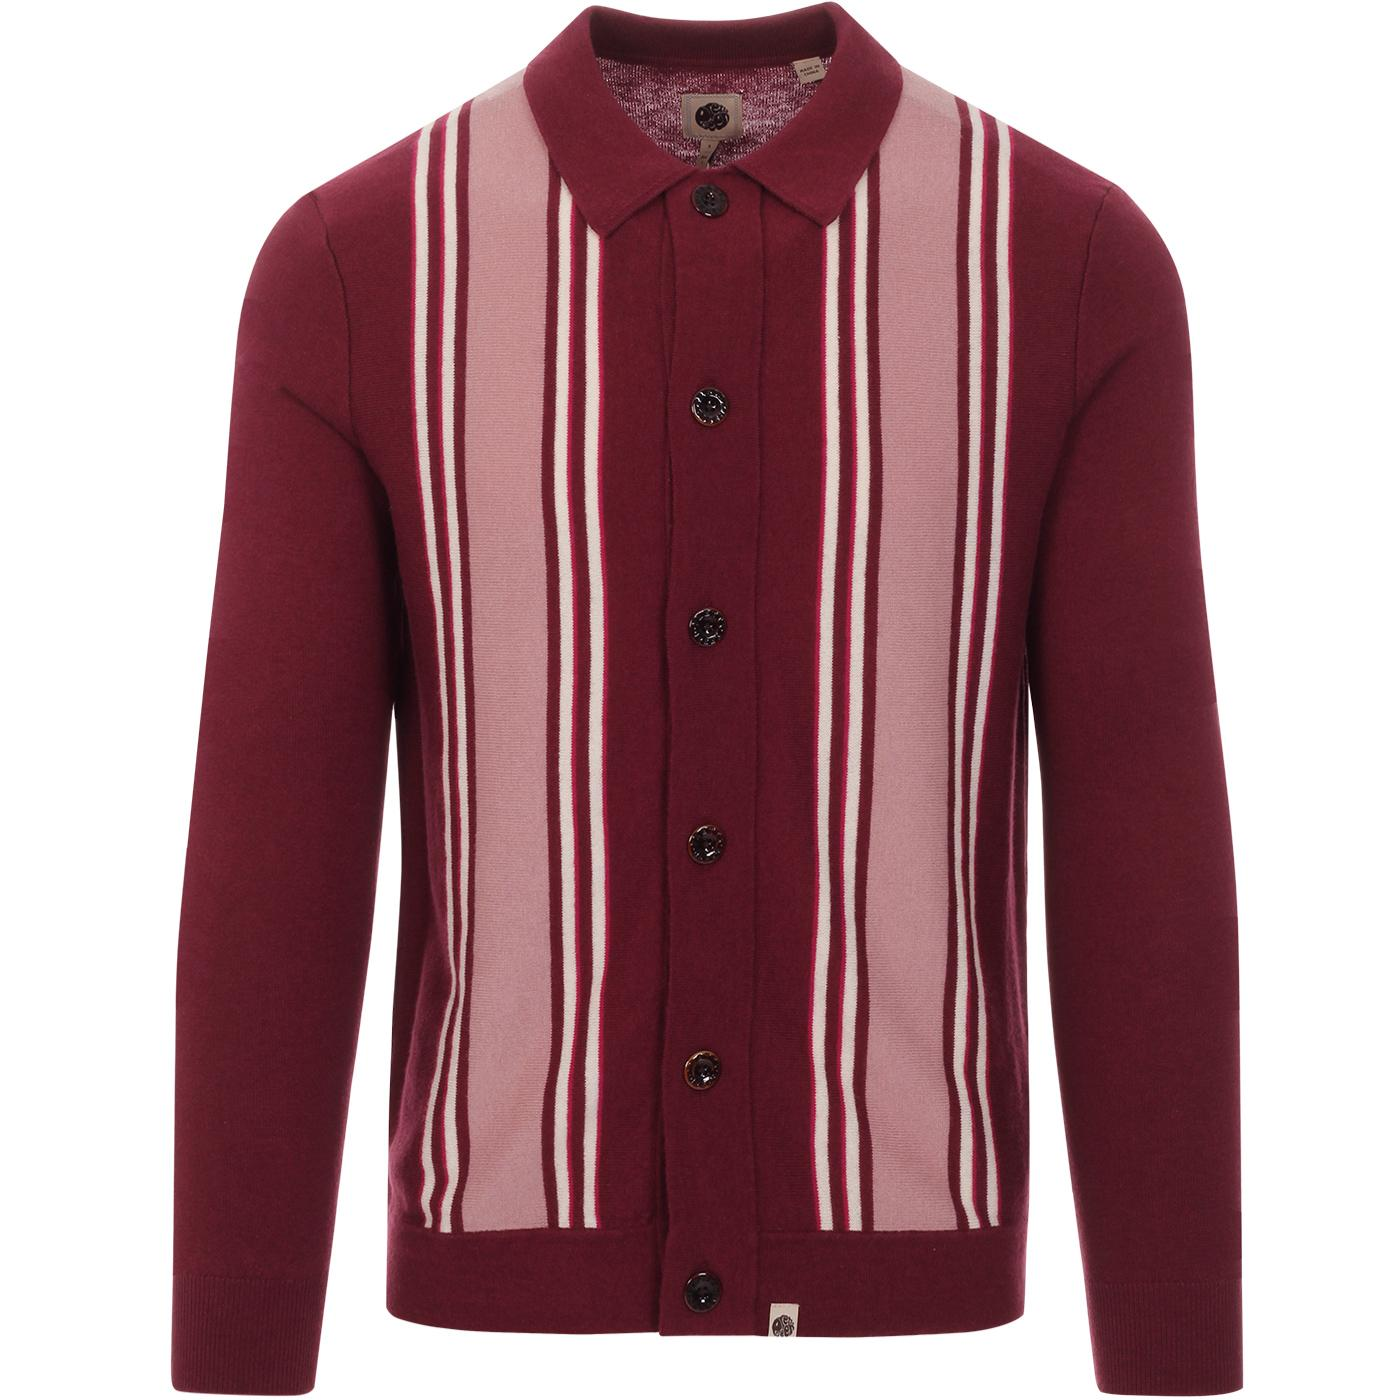 PRETTY GREEN Bingham Mod Stripe Polo Cardigan RED